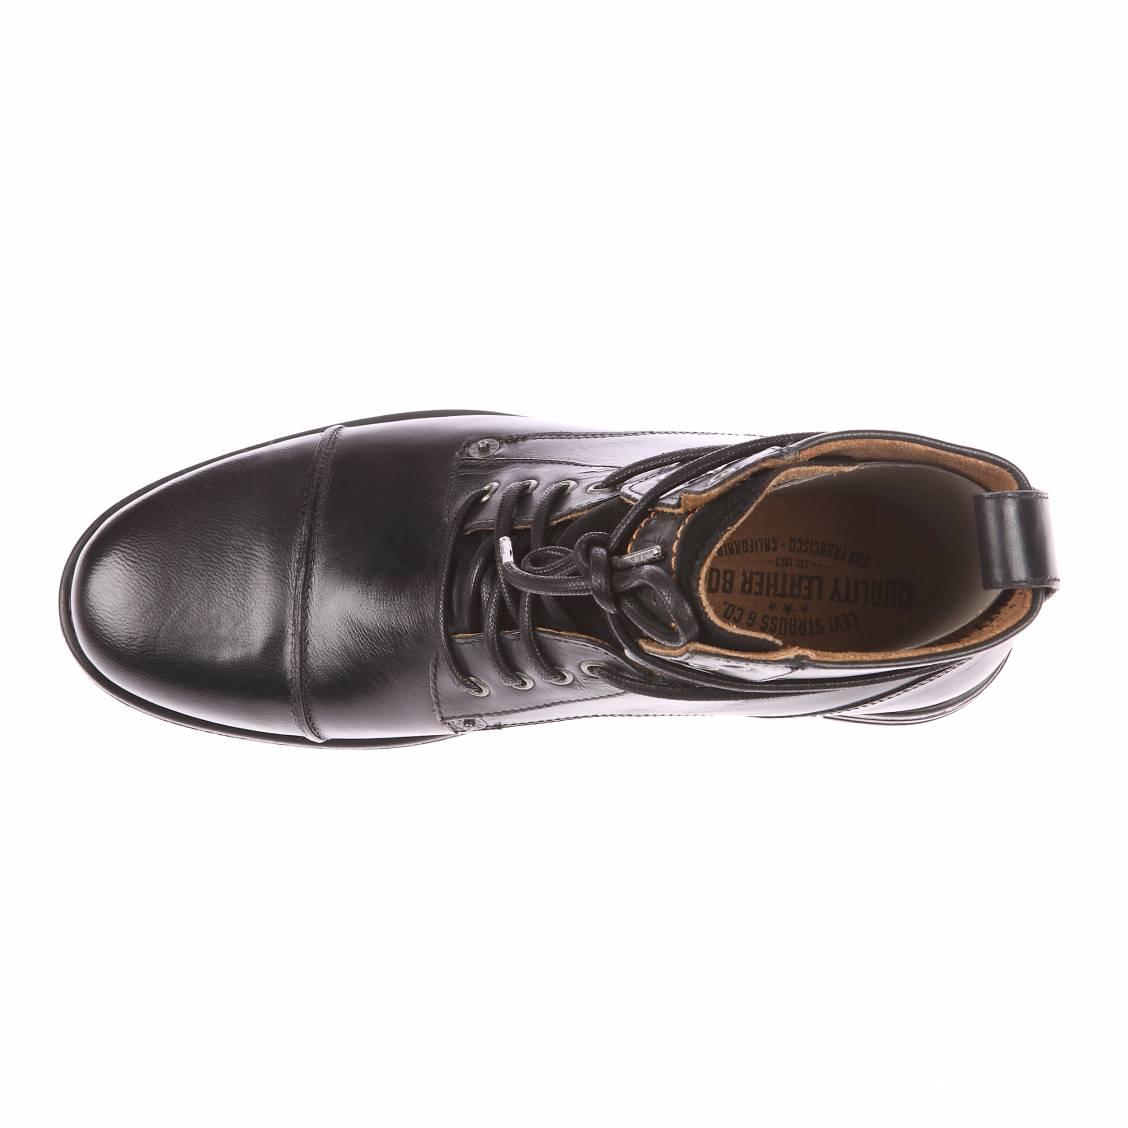 bottines emerson lace up levi 39 s en cuir noir rue des hommes. Black Bedroom Furniture Sets. Home Design Ideas